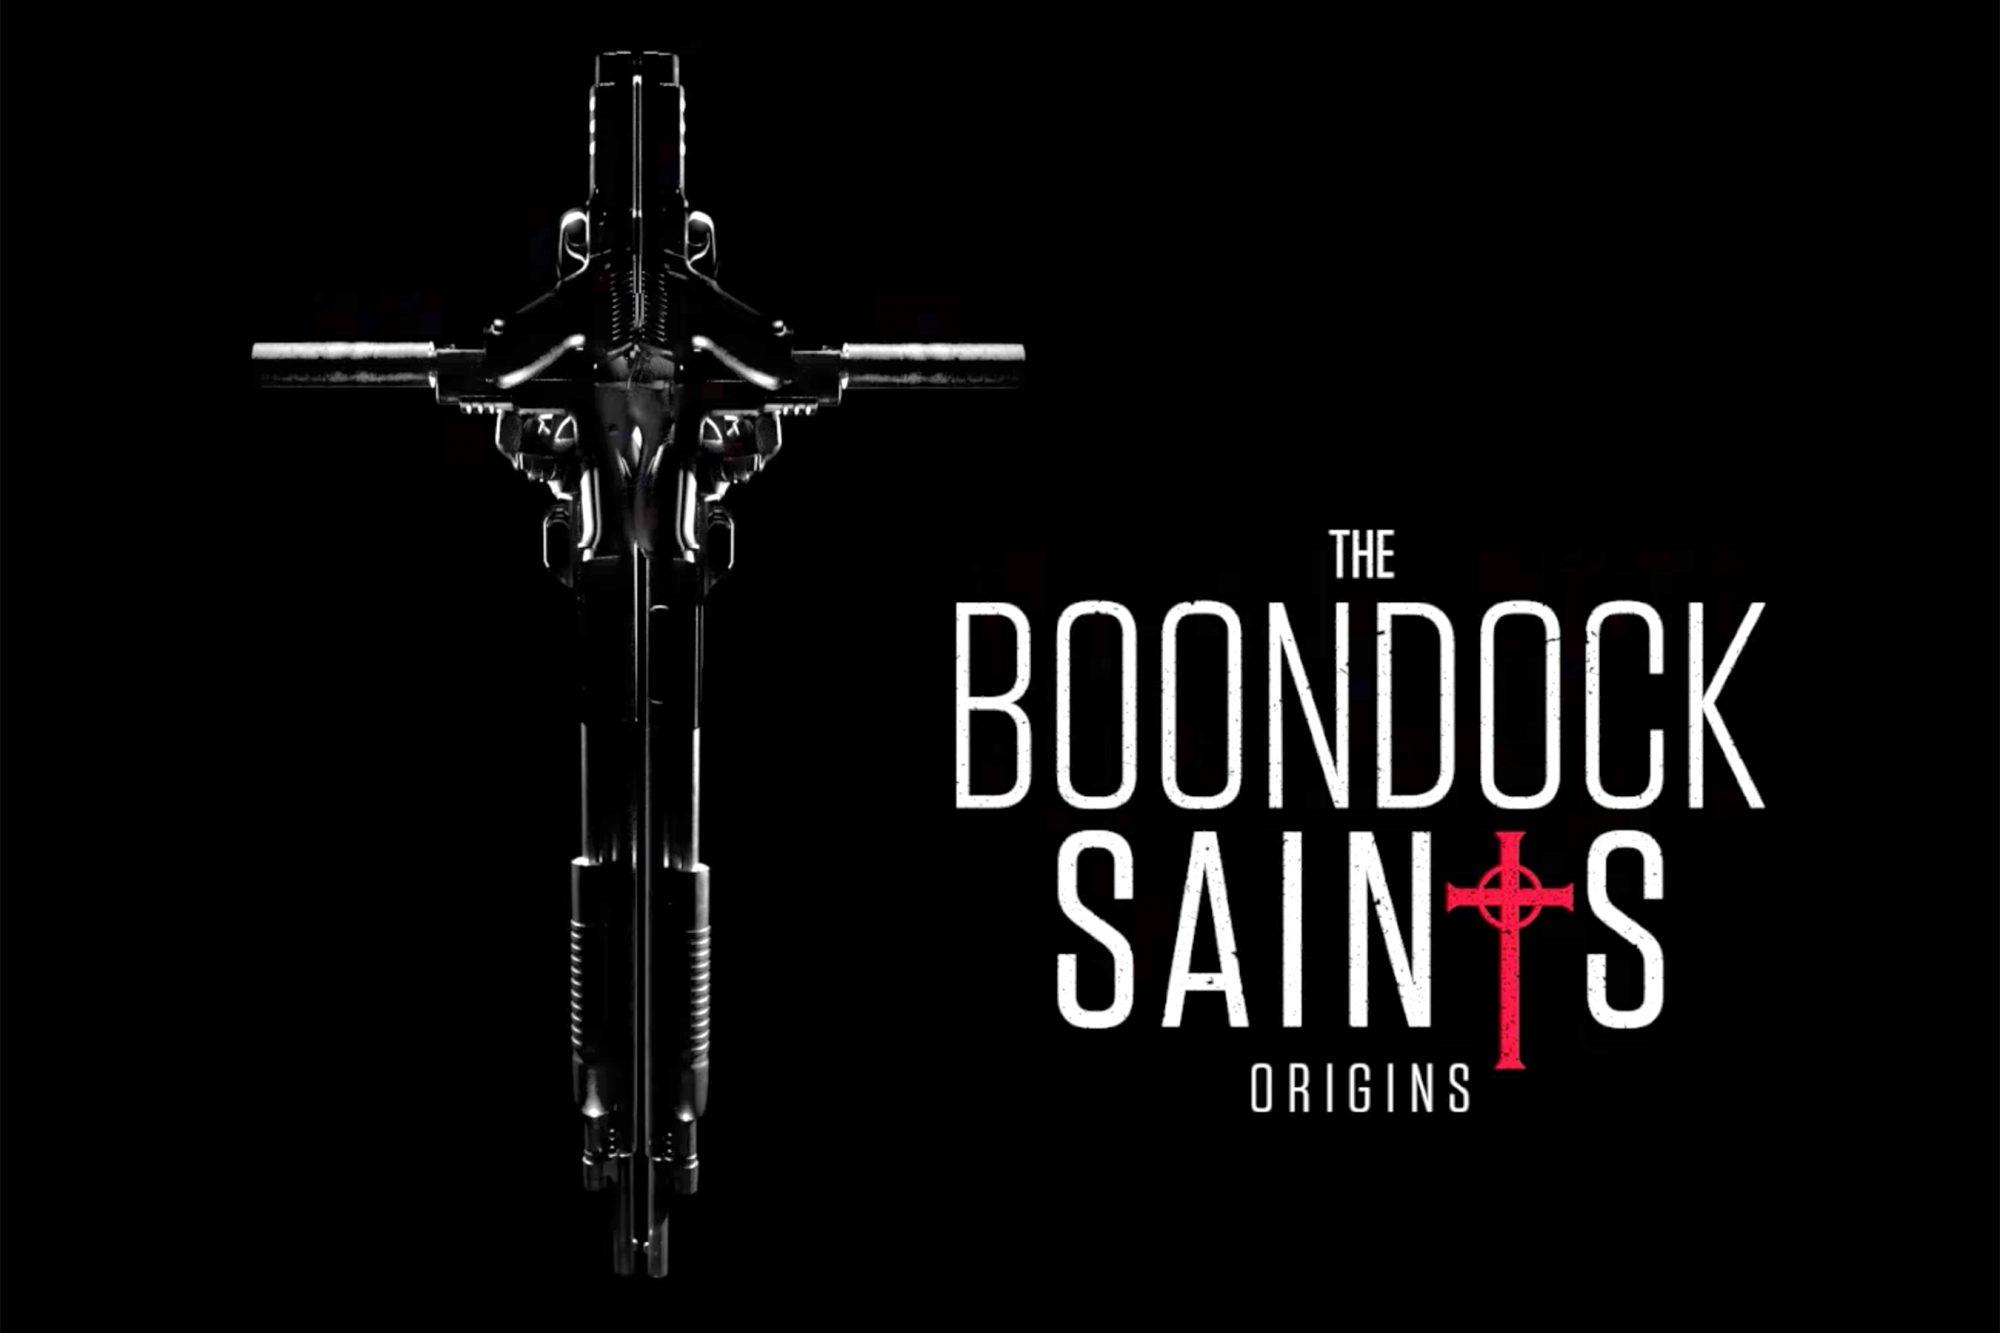 Boondock Saints Origins